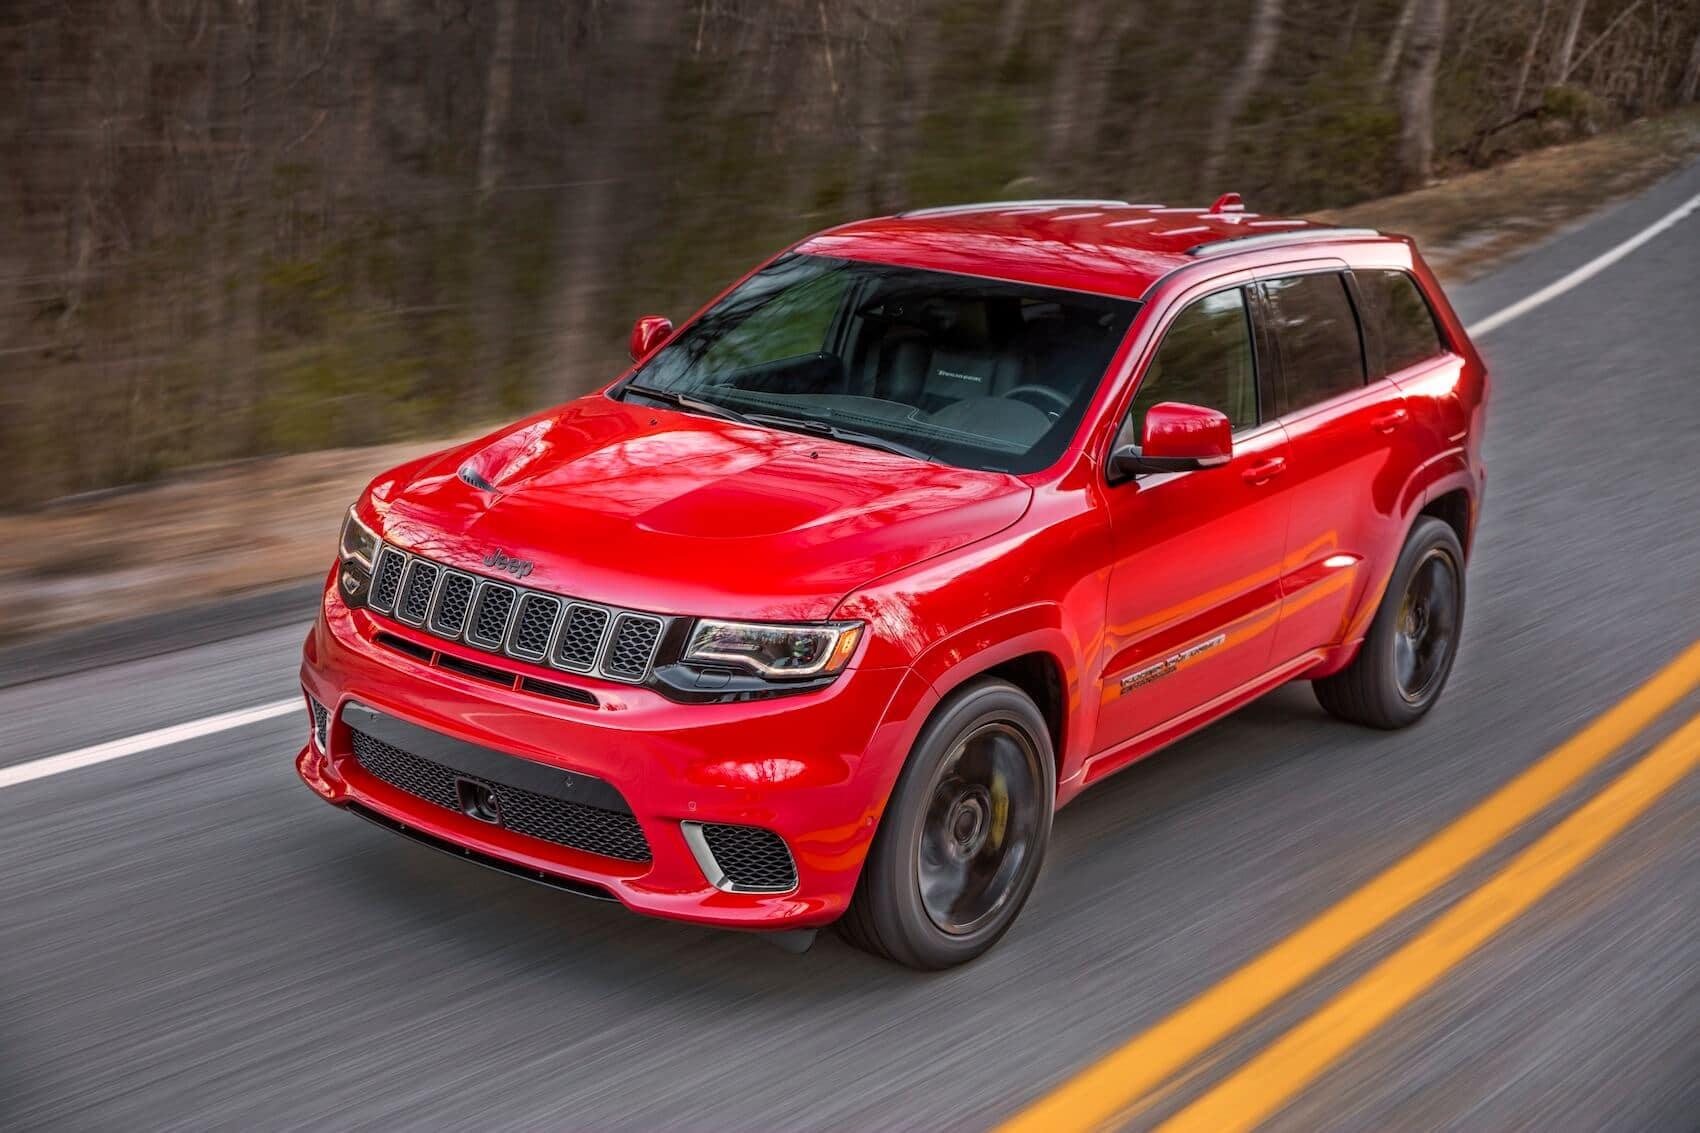 Jeep Grand Cherokee Trackhawk Red